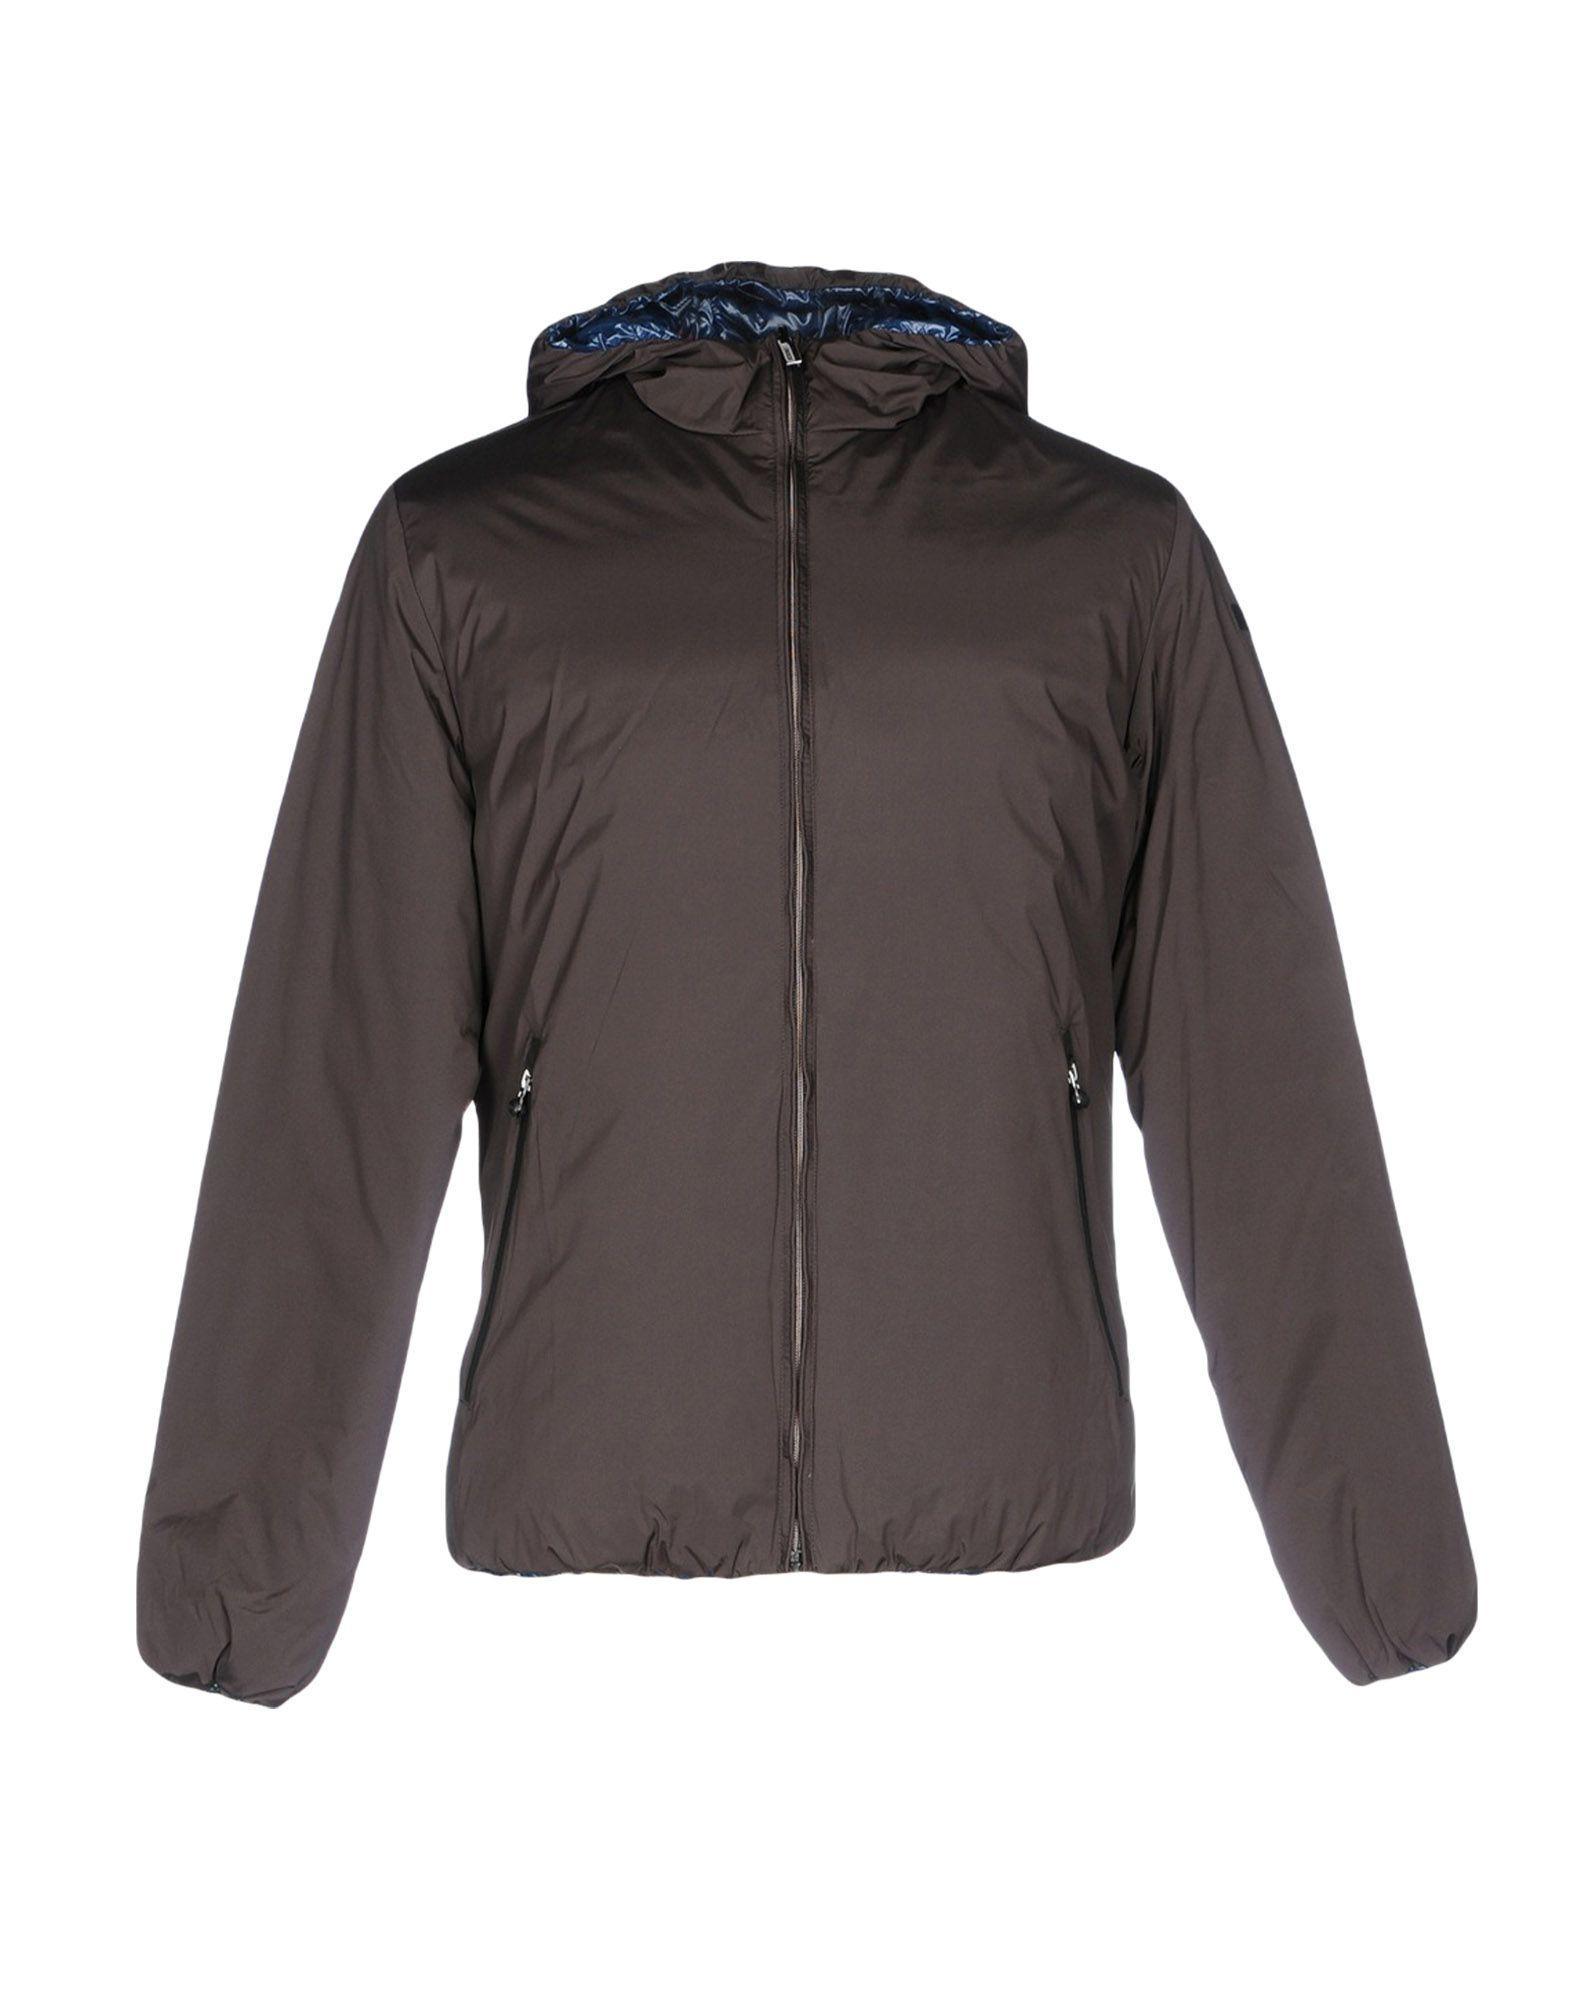 Rrd Down Jacket In Dark Brown